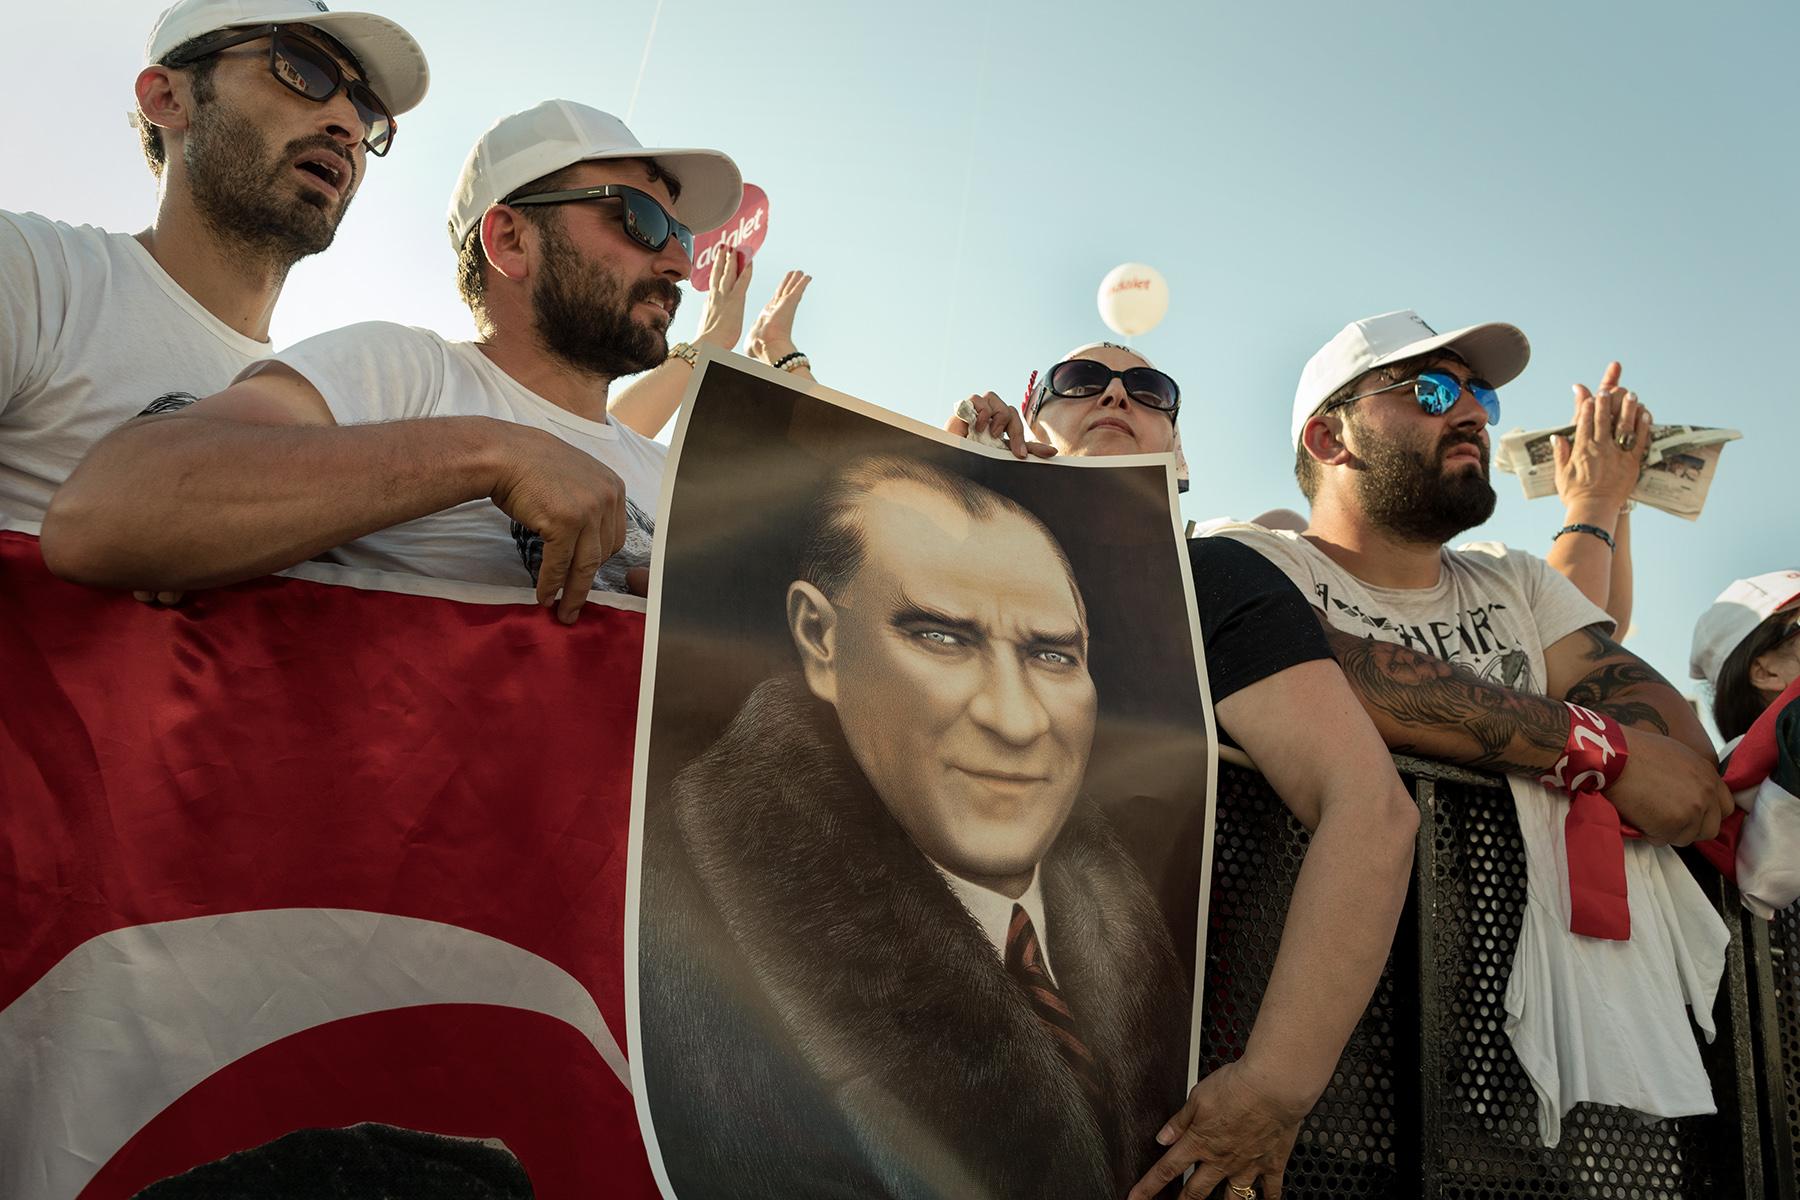 Turkey, July 9, 2017 - Kemalist supporters attend the 'Justice Rally' hold by CHP leader Kılıçdaroğlu to challenge the Turkish President Erdoğan.